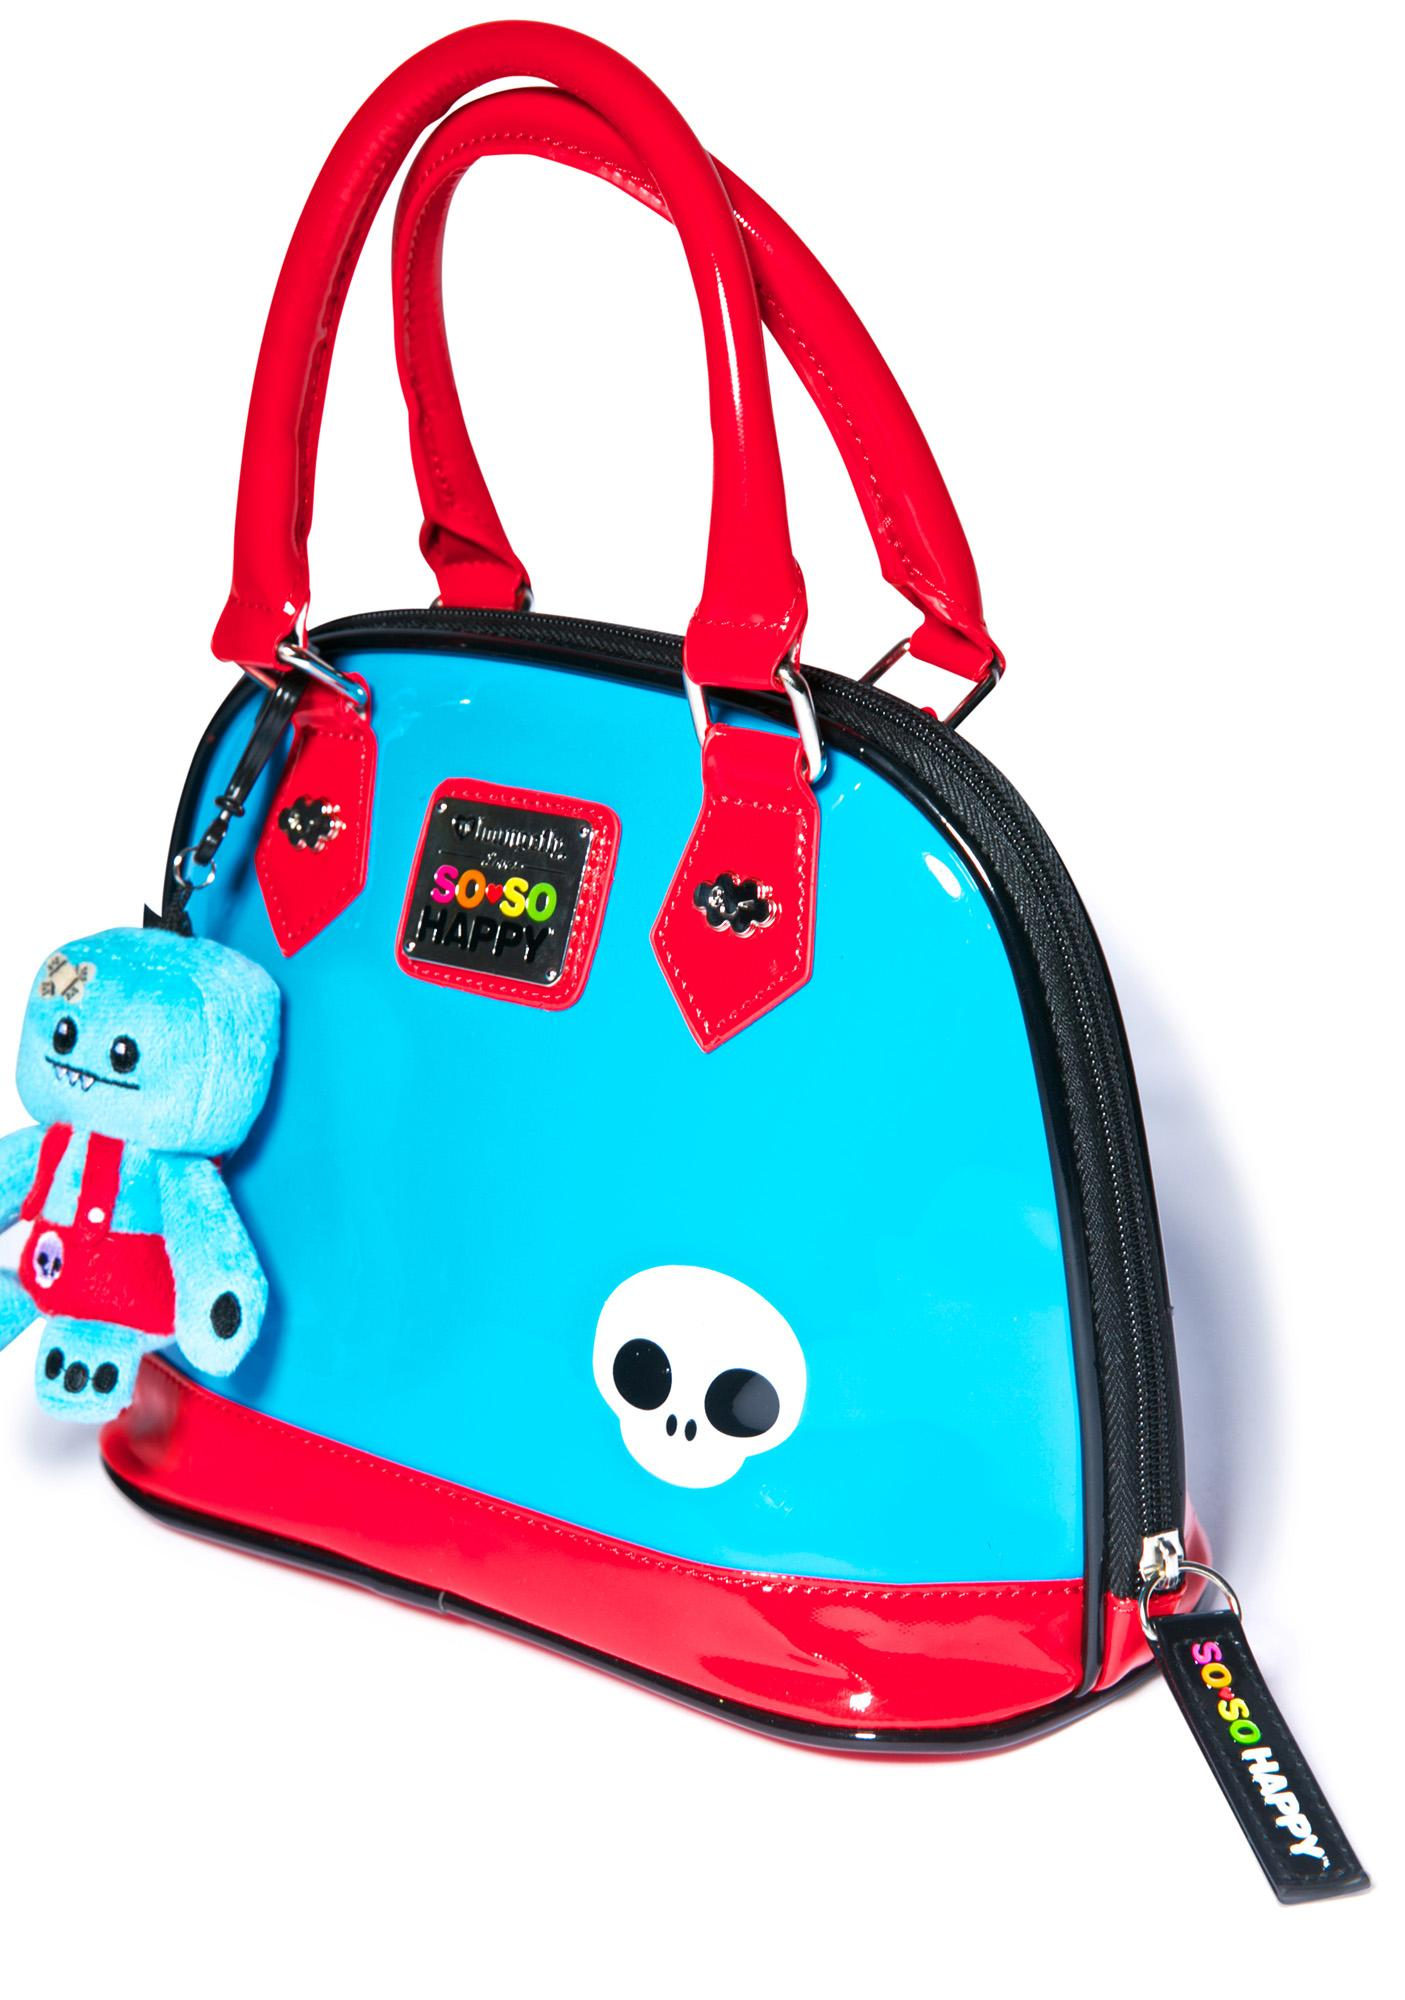 Iron Fist Ozzie Bowler Bag